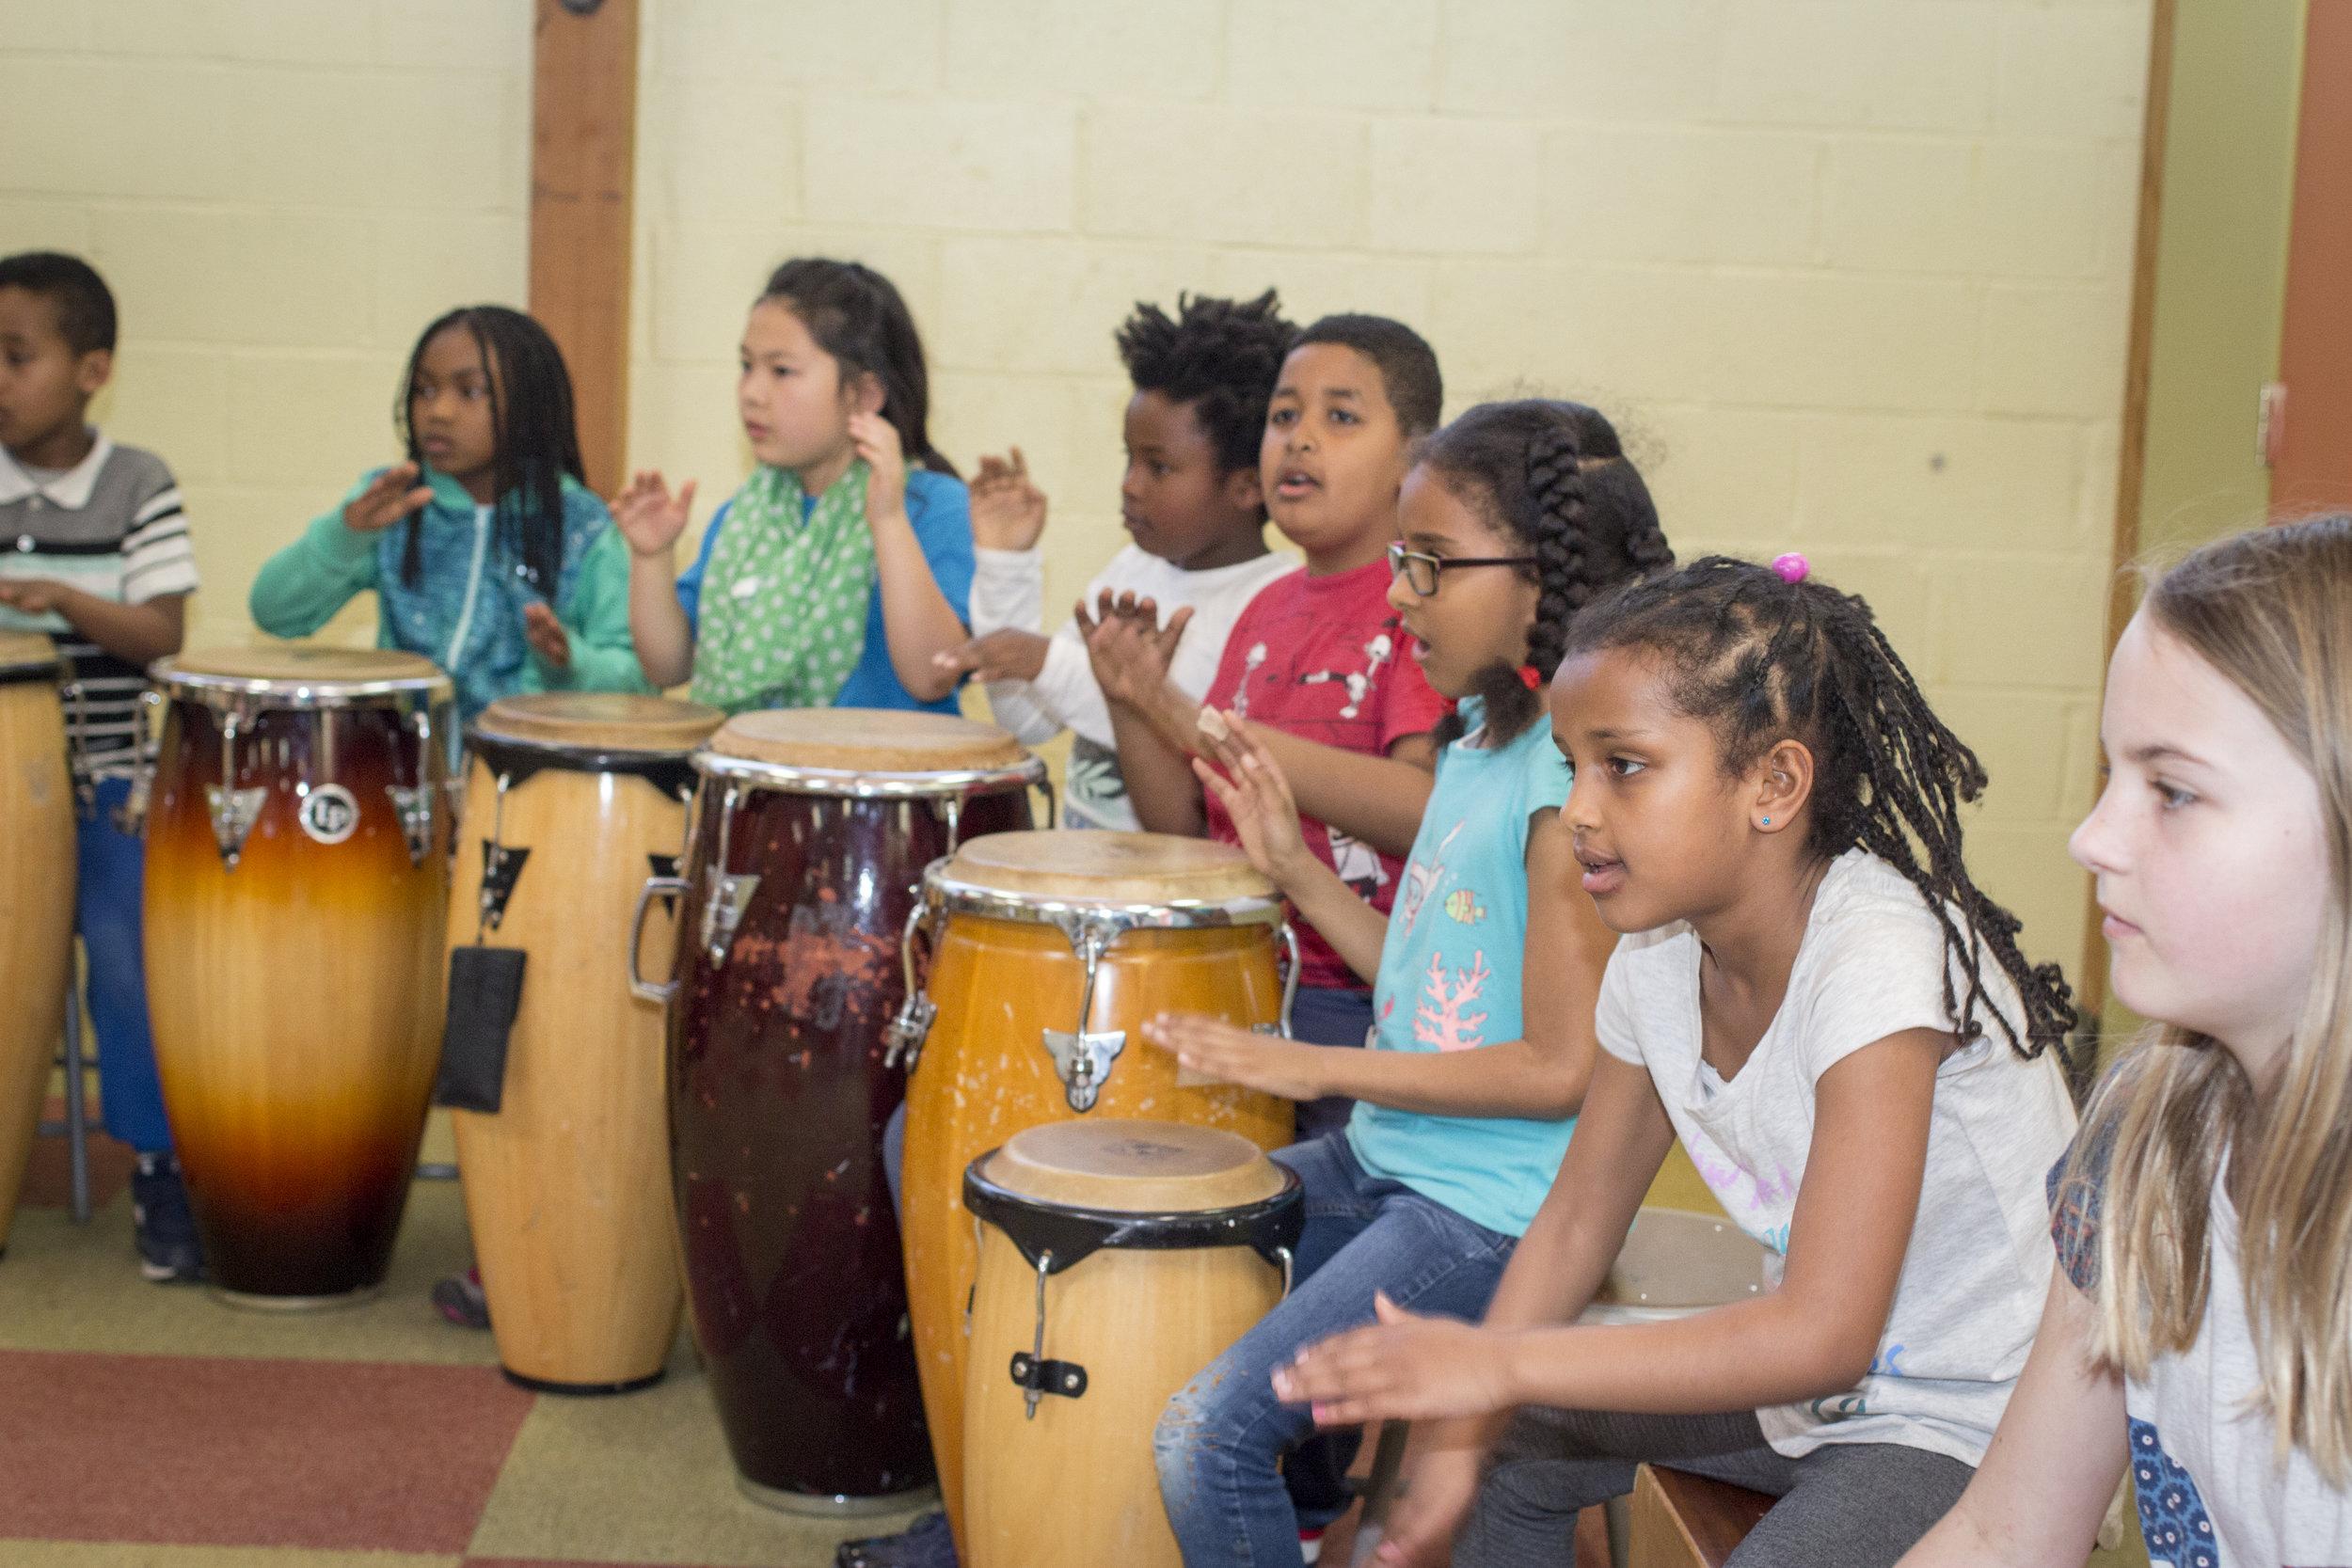 _MG_2157 NOCCS 031717 drums and kids.jpg